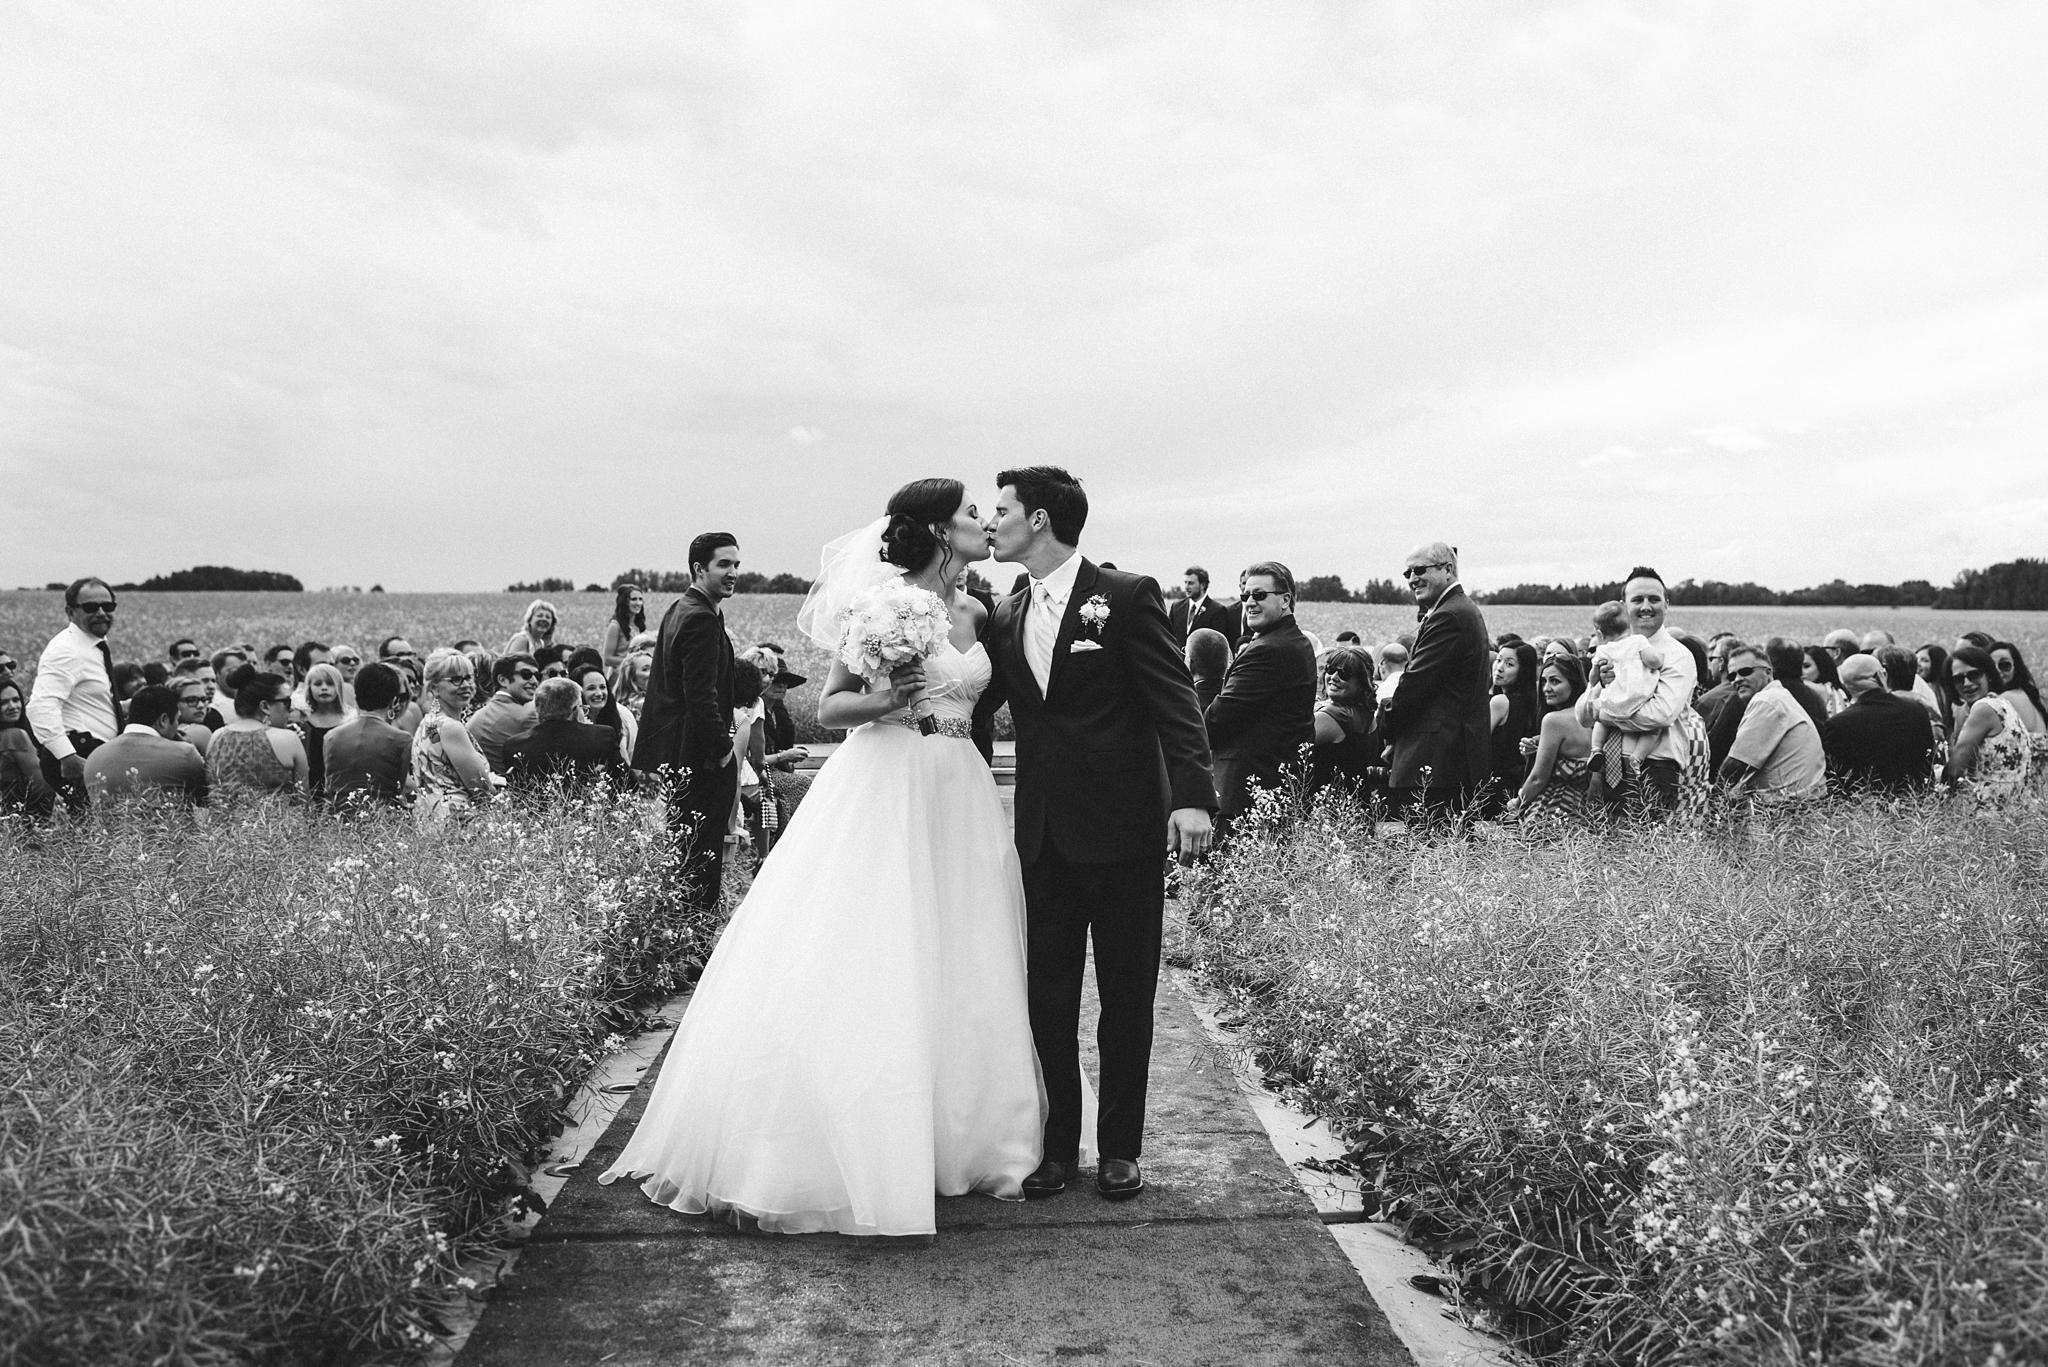 kaihla_tonai_intimate_wedding_elopement_photographer_0060